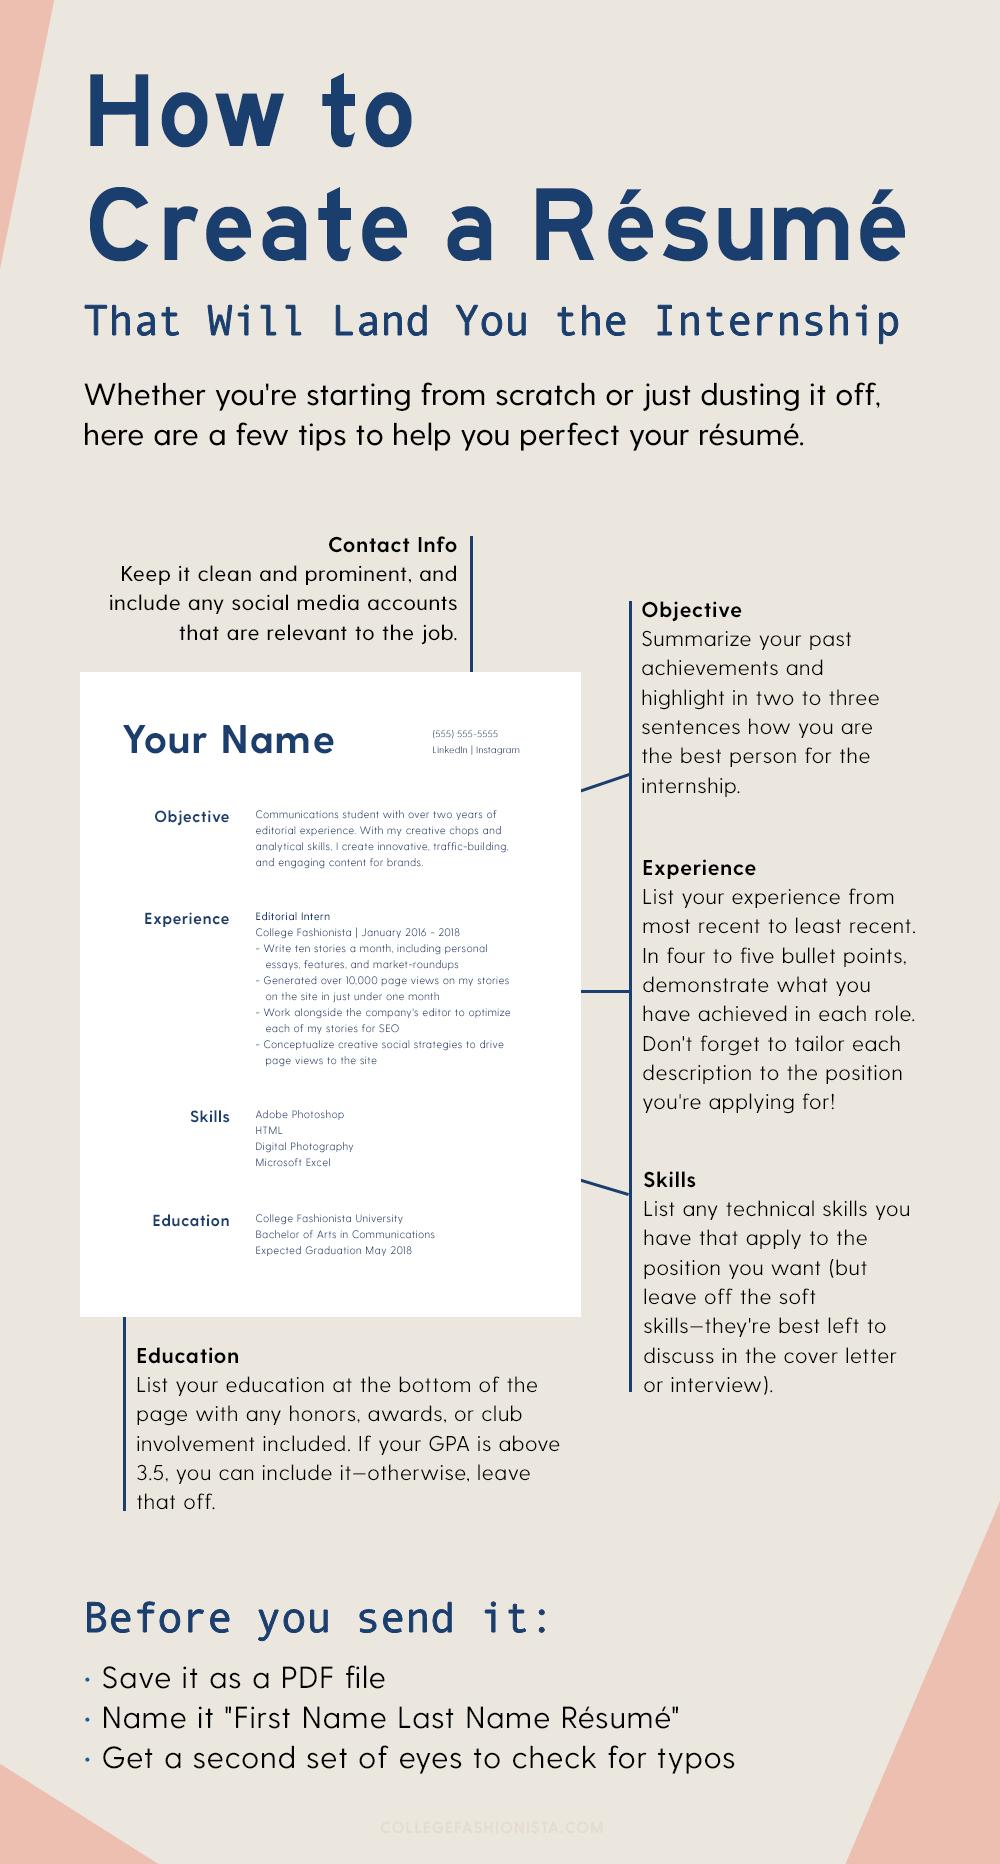 23 Résumé Tips to Help You Land Your Dream Internship